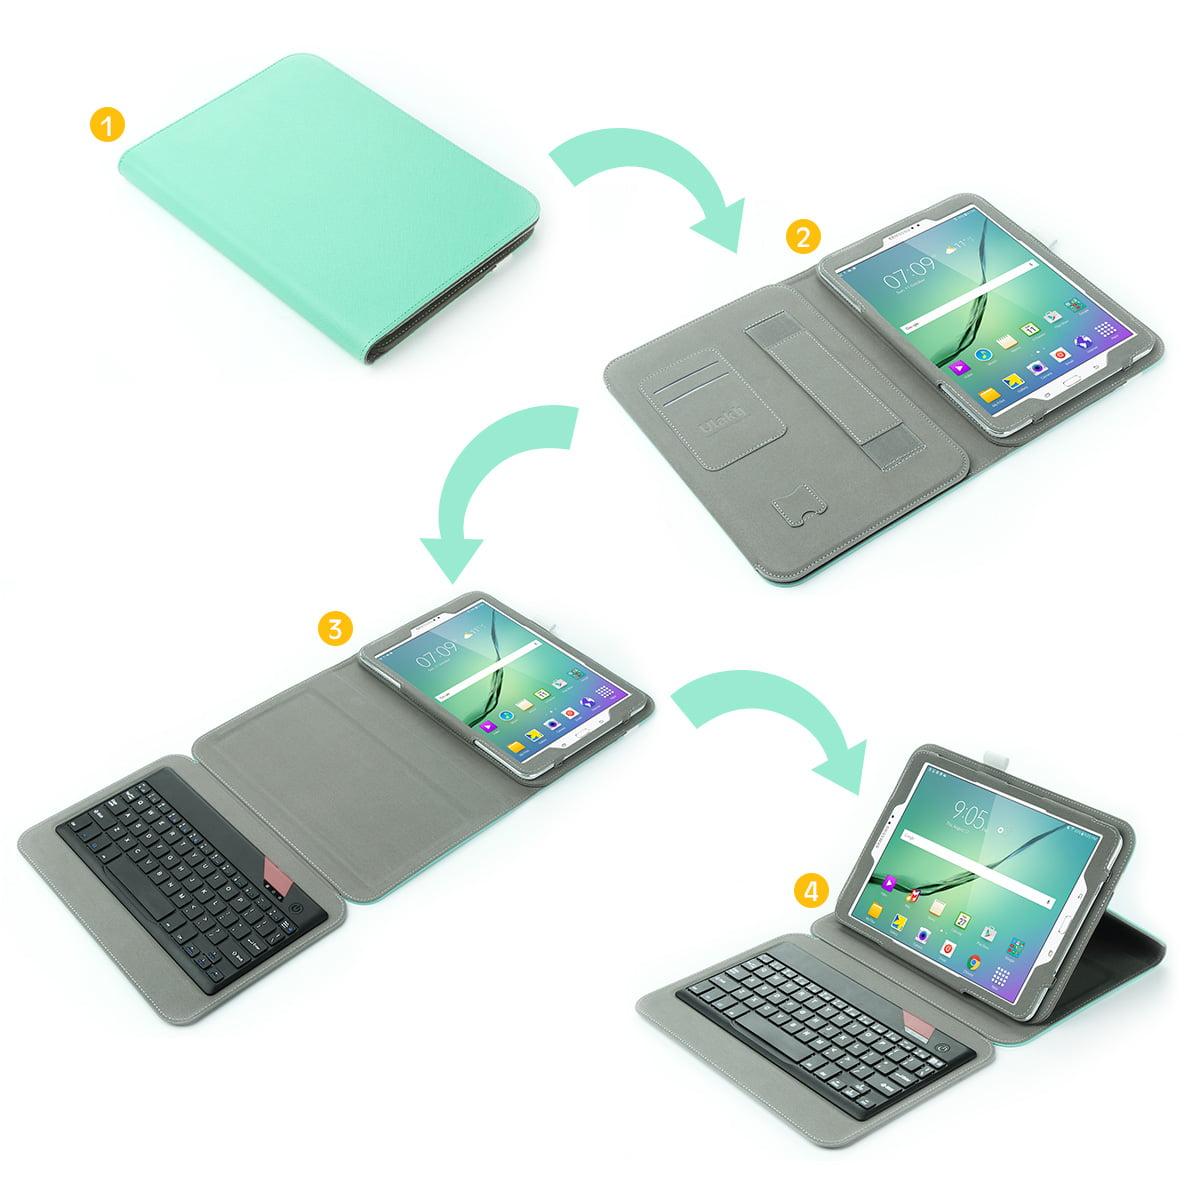 pretty nice 97ef9 95b88 ULAK Galaxy Tab S2 Case, Tab S2 Keyboard, Portable Bluetooth Keyboard with  Built In Hand Strap & Media Stand for Samsung Galaxy Tab S2 (9.7 inch) 2015  ...